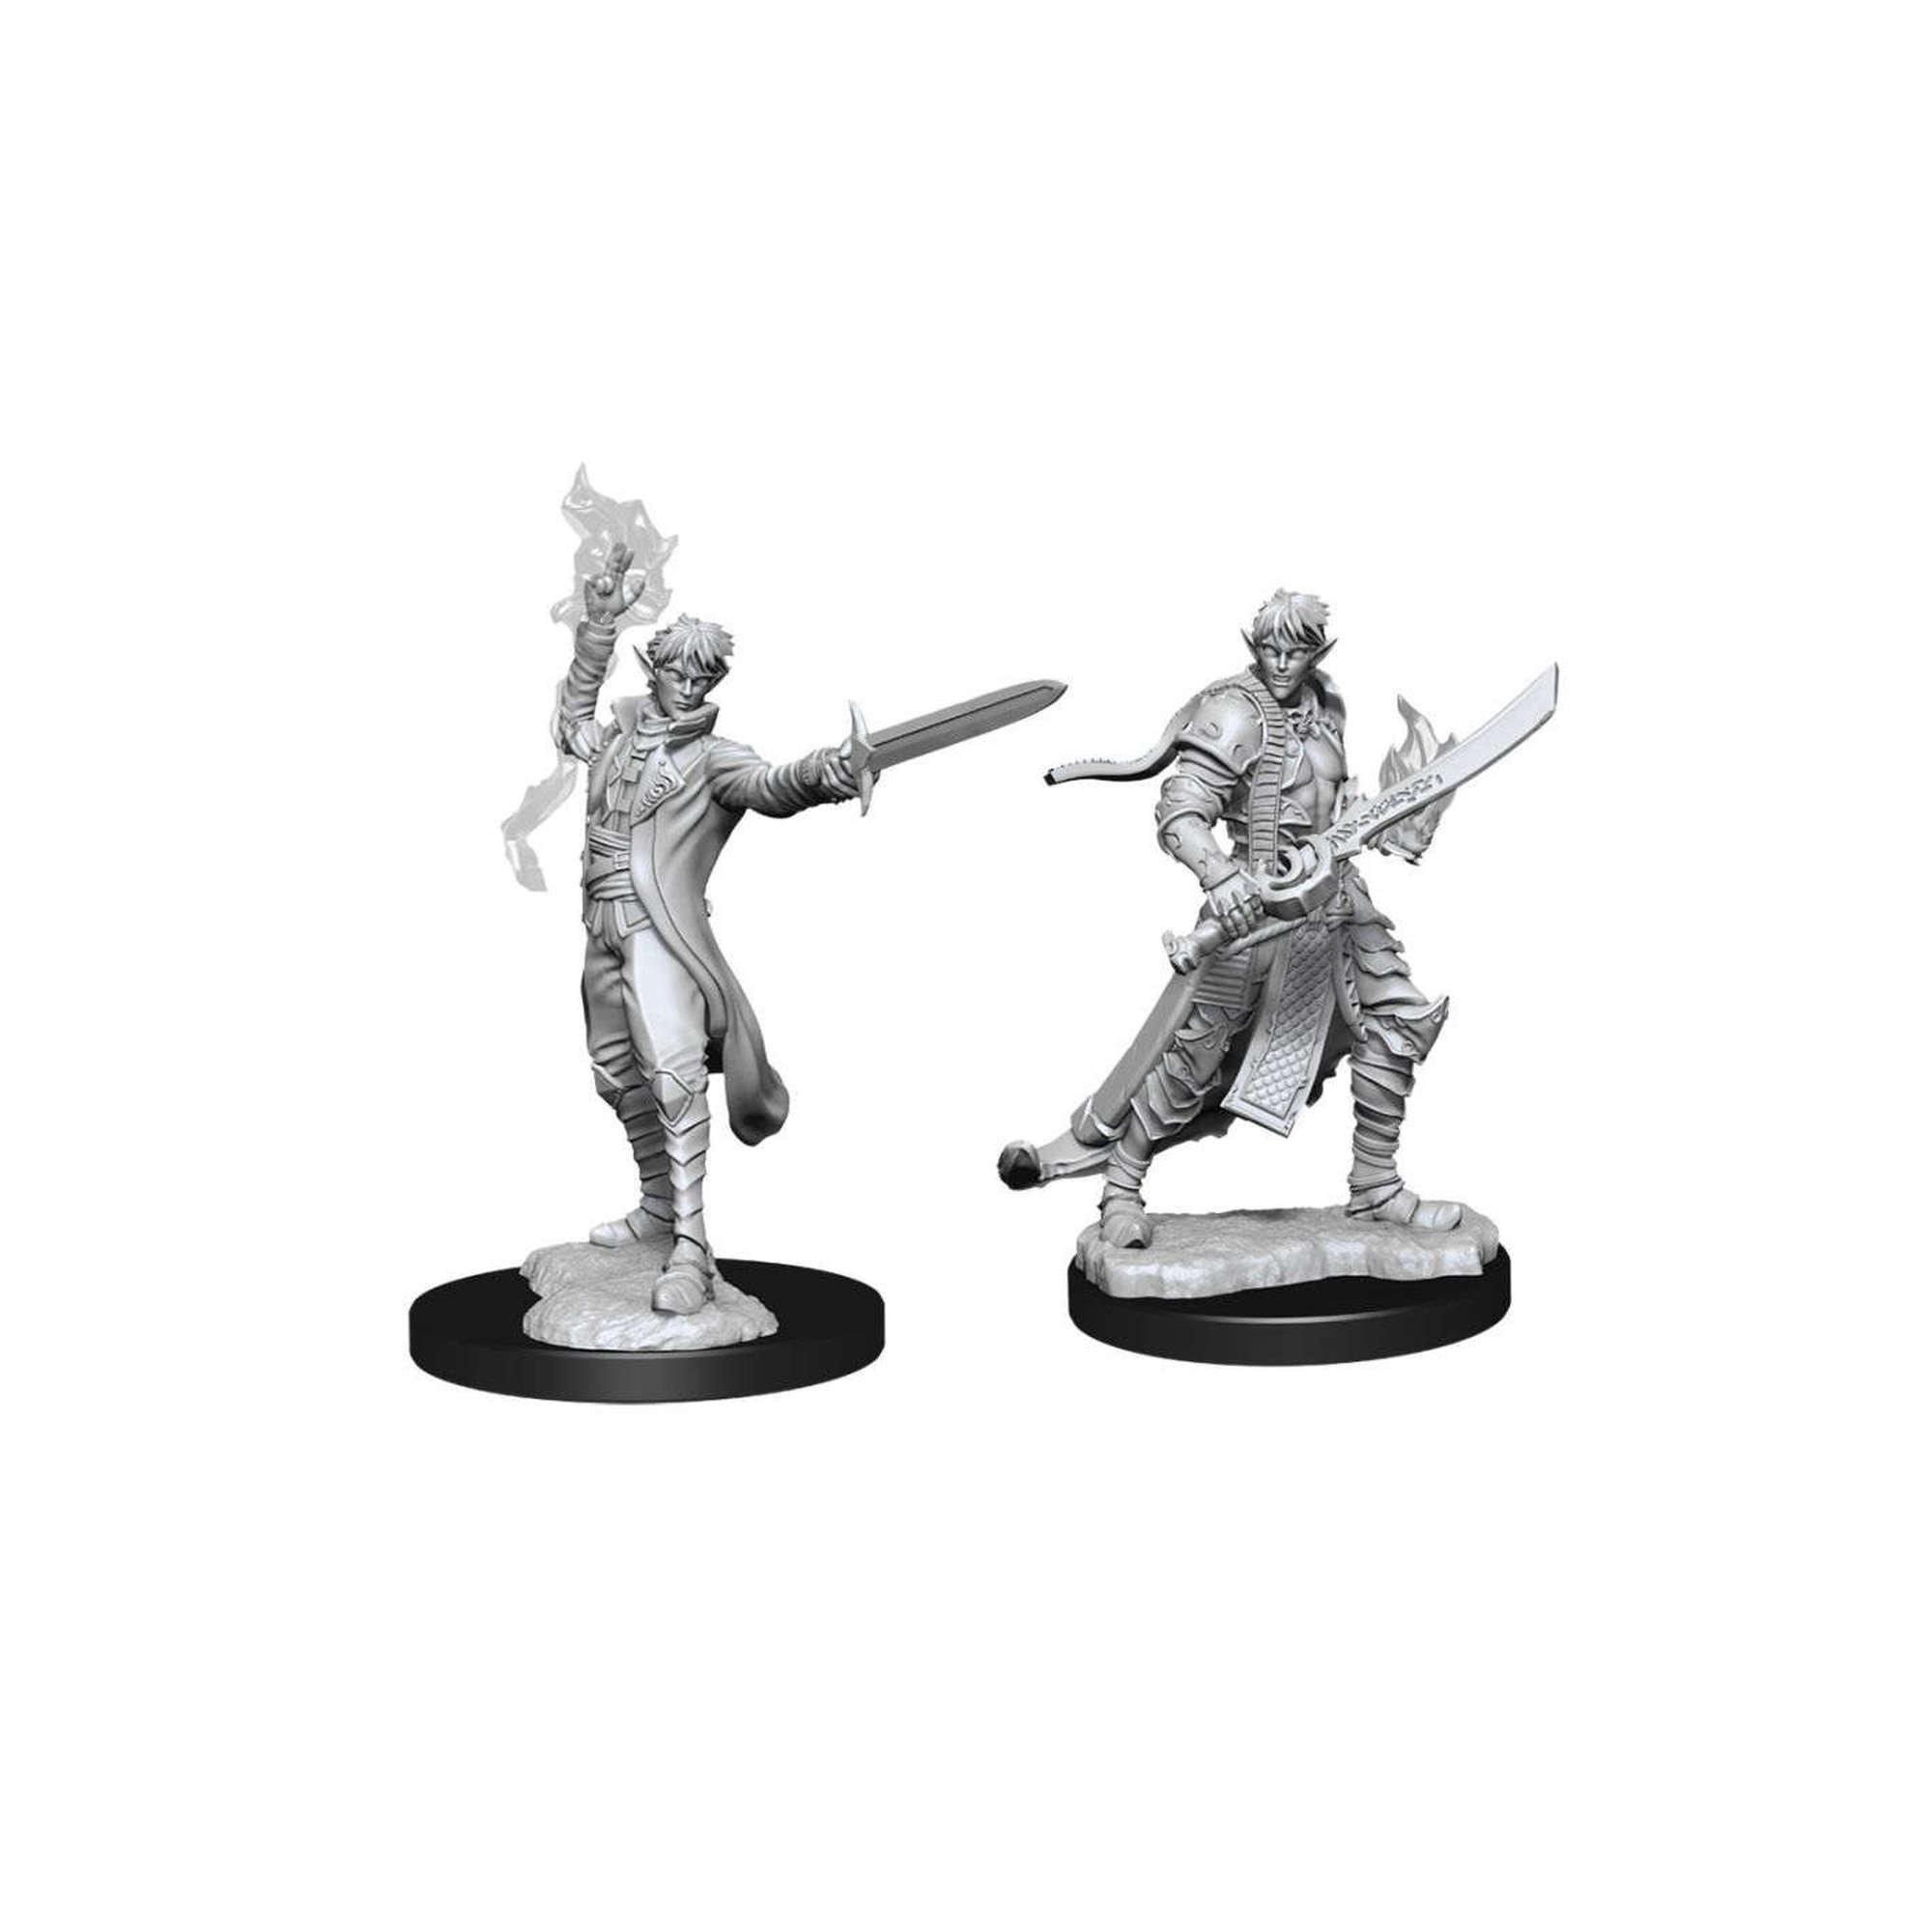 Wizkids Games Pathfinder Unpainted Minis WV11 Male Elf Magus